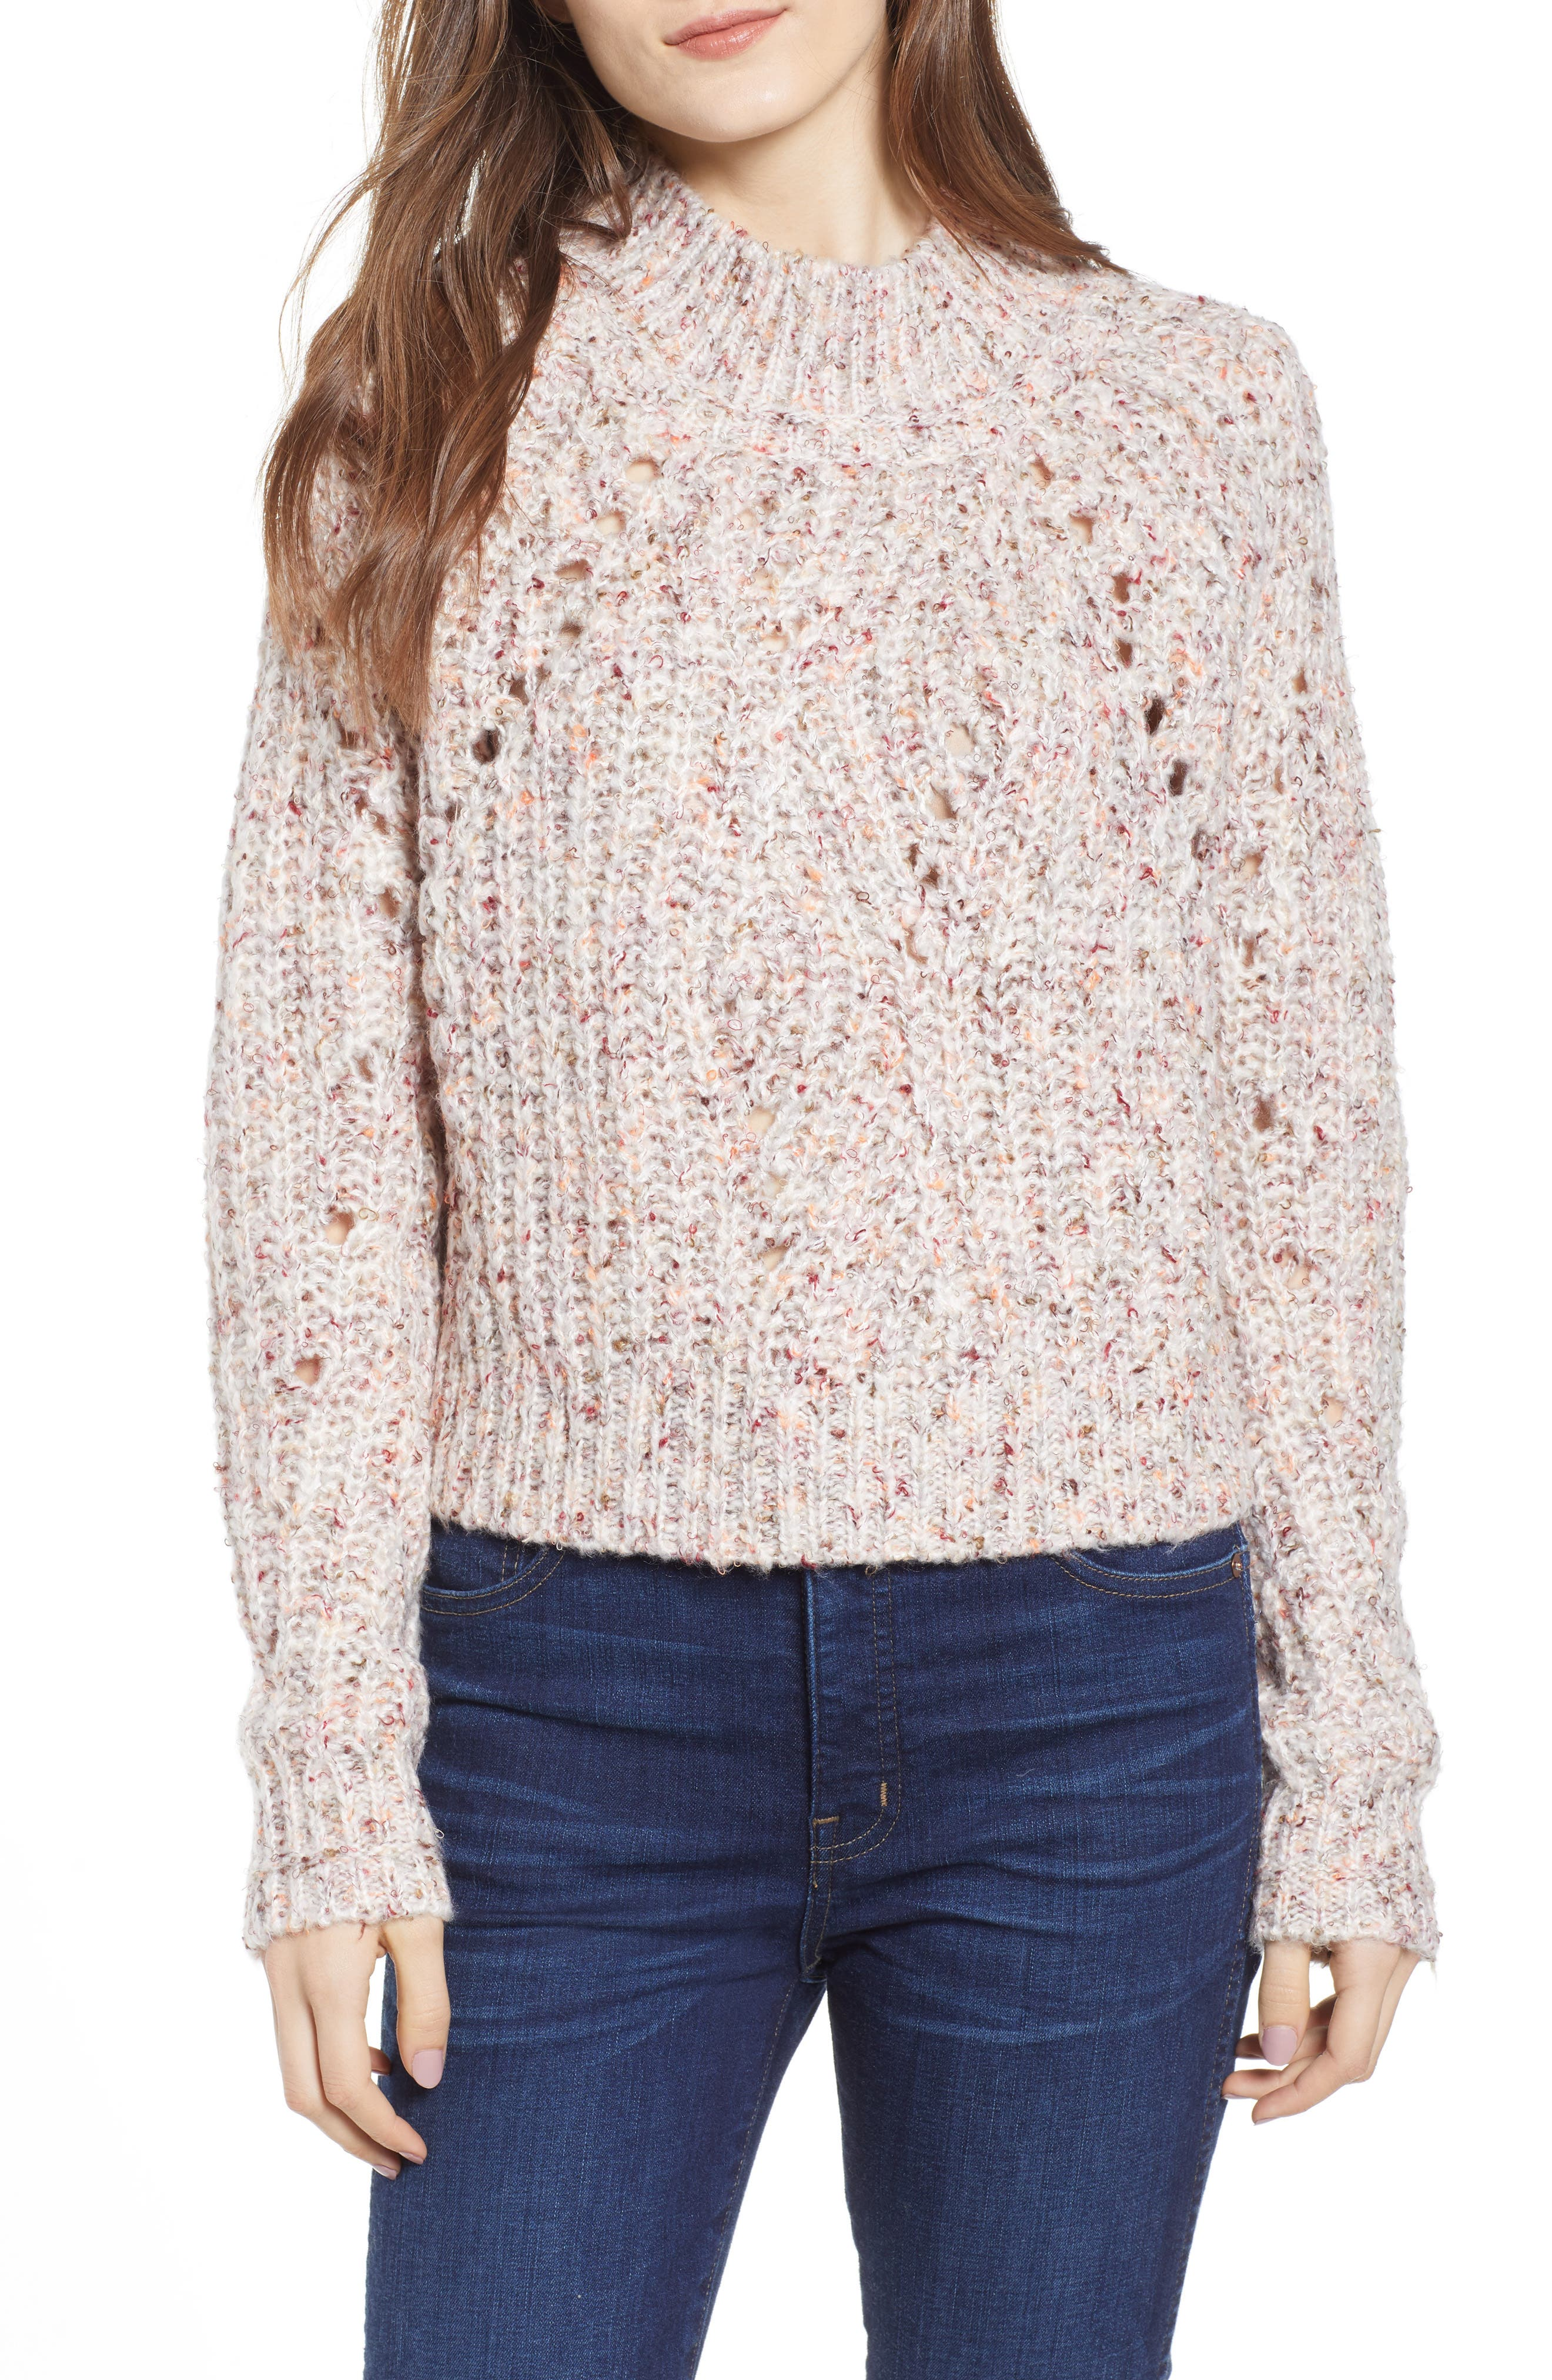 Heartloom Mally Sweater, Pink